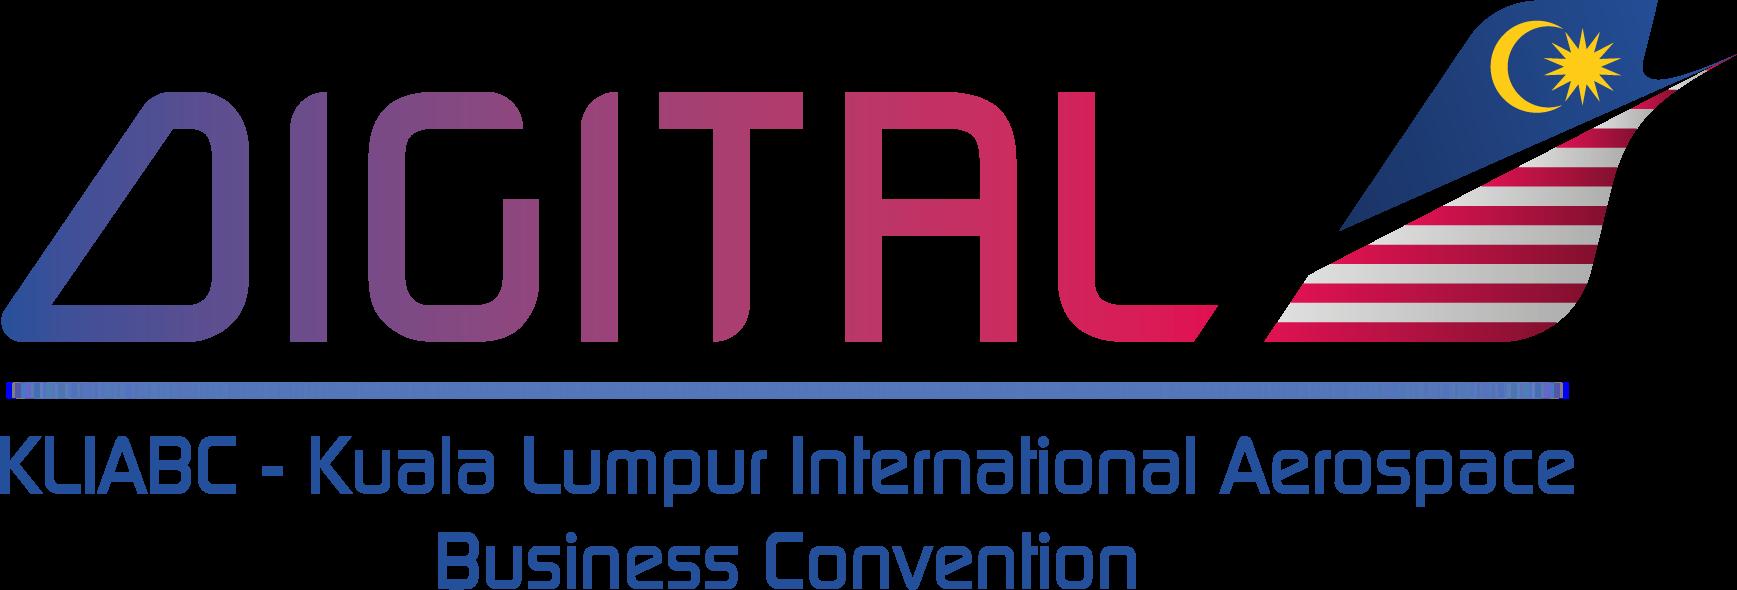 Digital Kuala Lumpur International Aerospace Business Convention